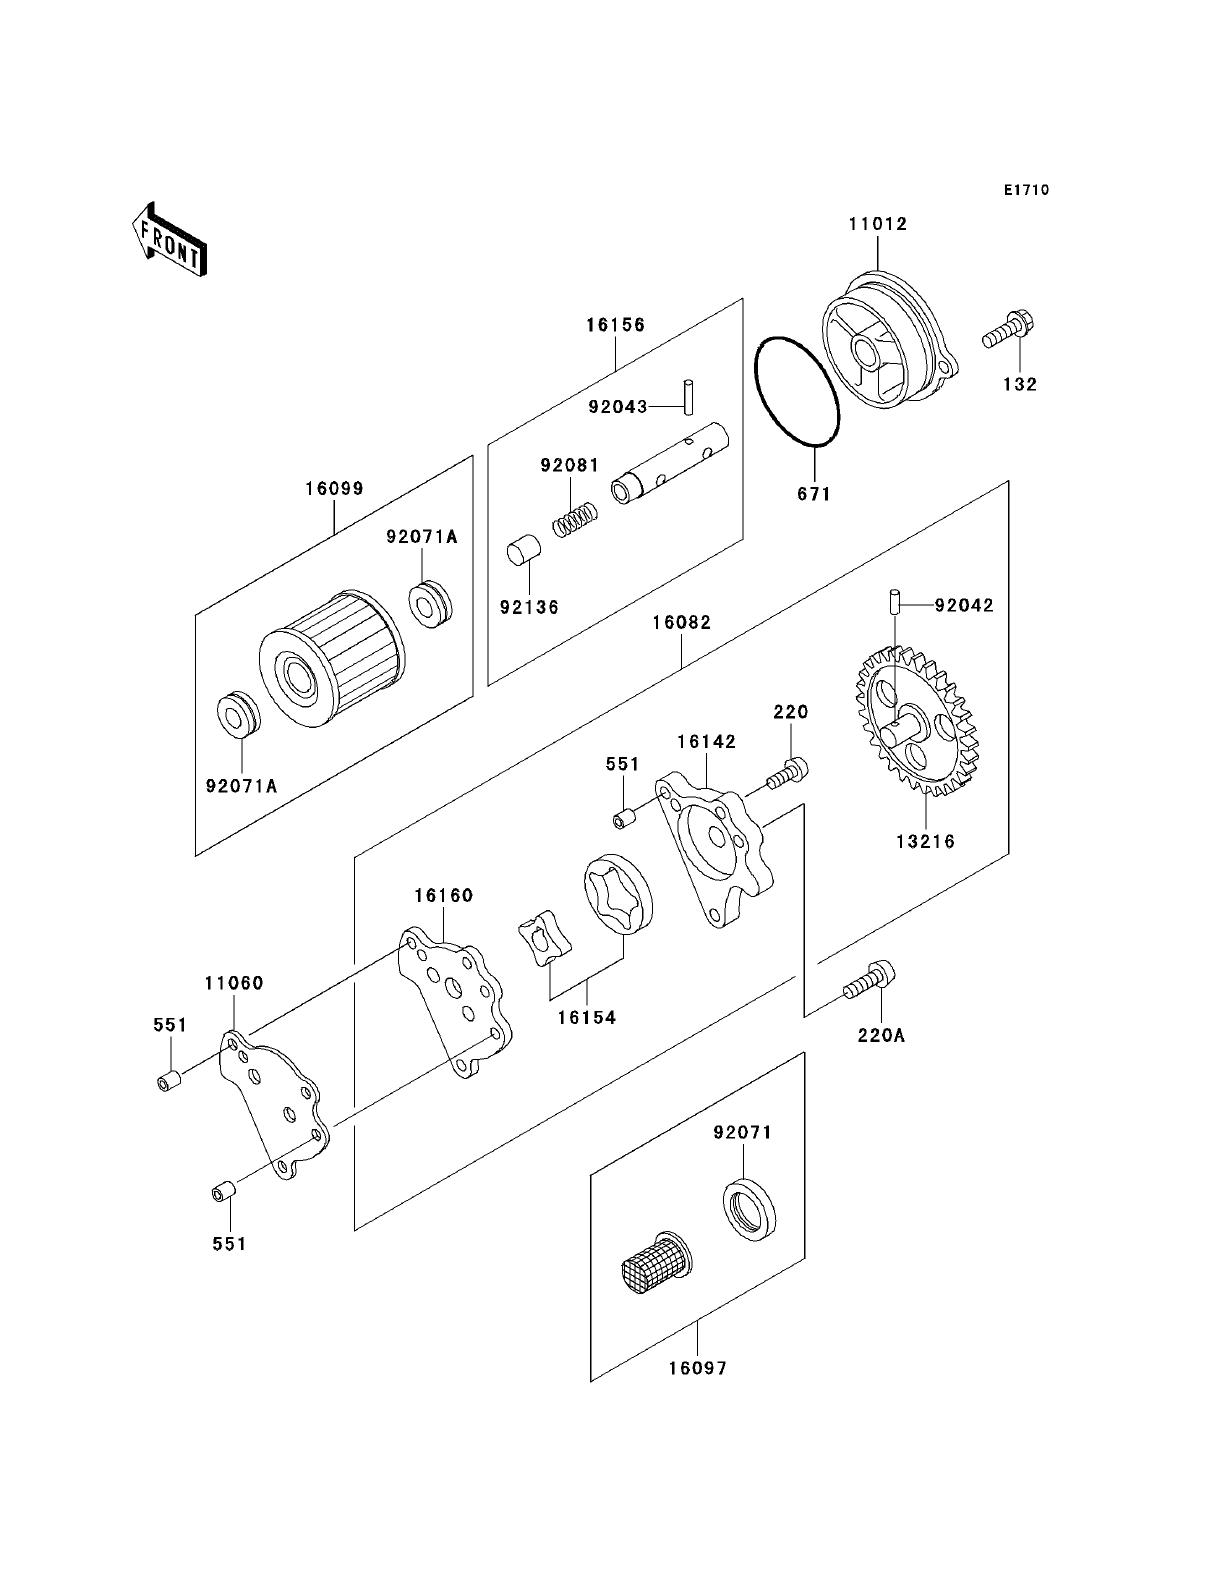 Isuzu 4hk1 Engine Wiring Diagram Auto Electrical Wire 3lb1 2 3 Motor